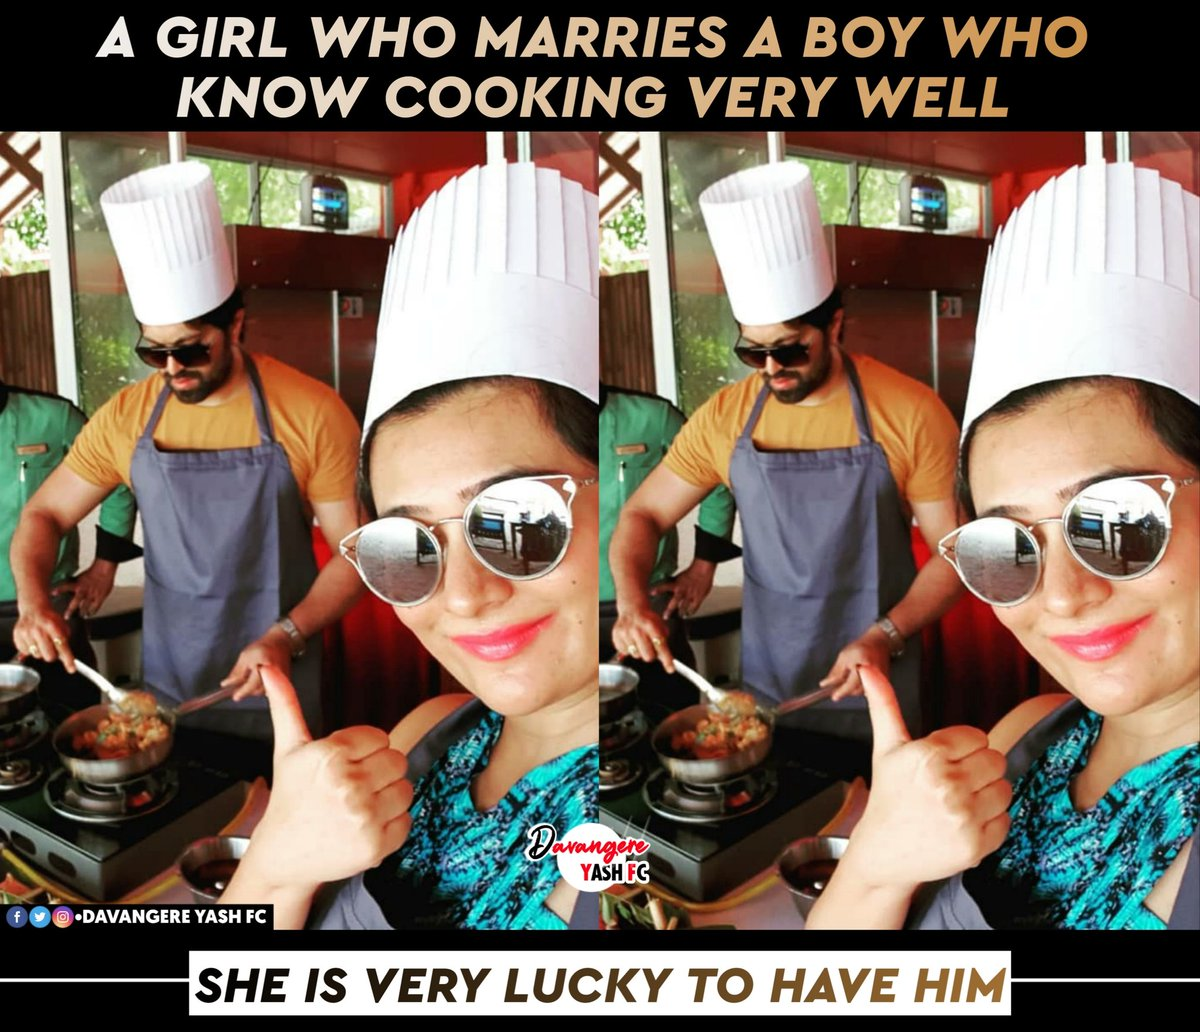 A Girl Who Marries A Boy Who Know Cooking Very Well She Is Very Lucky To Have Him❤️😍 @TheNameIsYash BOSS @RadhikaPandit7 athge  #radhikapandit  #nimmarp  #rockingstaryash #iamradhikapandit #yash #yashboss  #DavangereYashFC https://t.co/8uMbCeuDbR